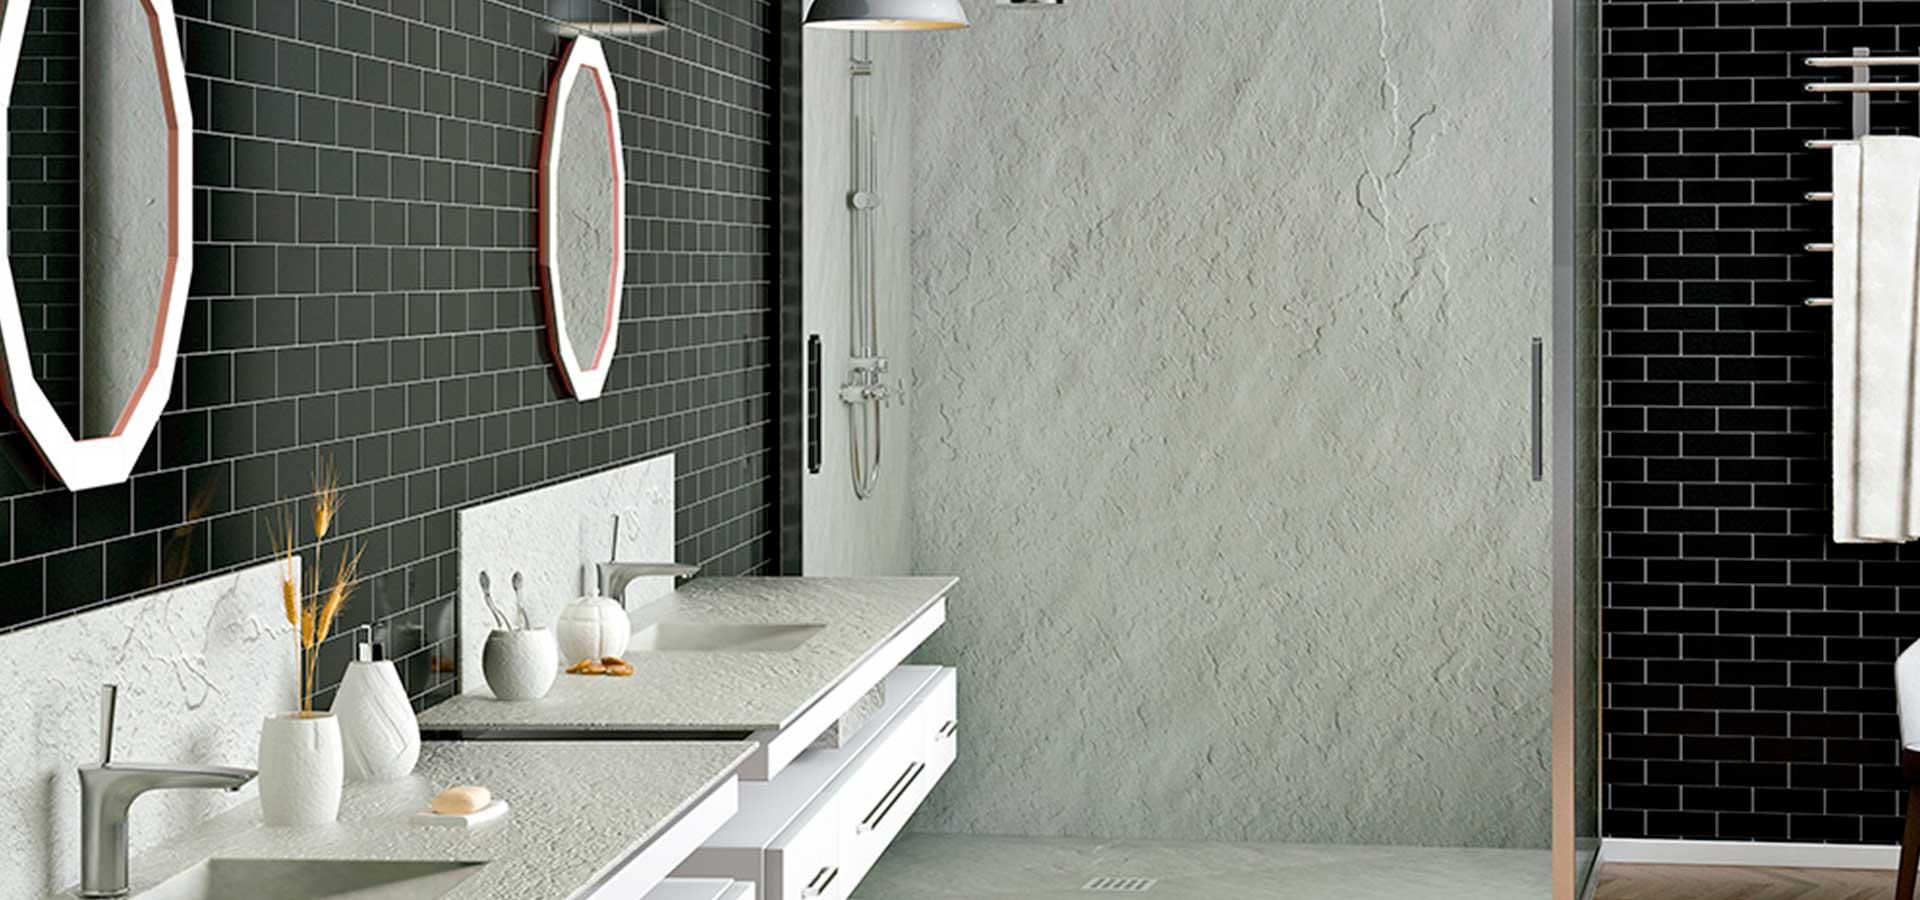 Meuble De Salle De Bain Allemand quare - quare | bathroom design & solutions